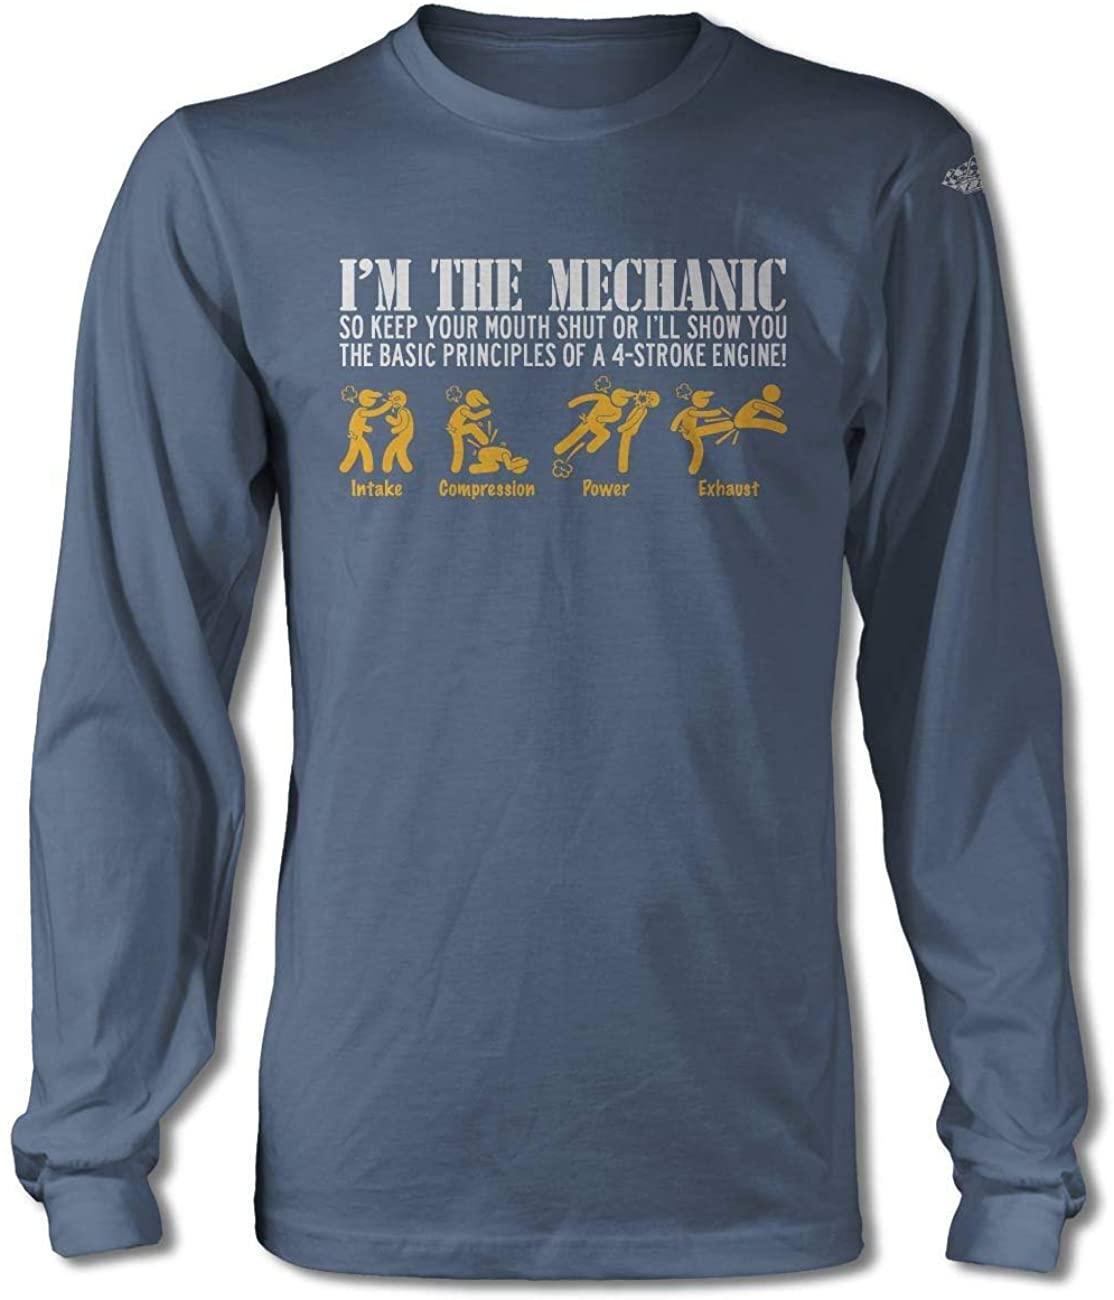 I'm The Mechanic - 4 Stroke Engine Long Sleeve T-Shirt